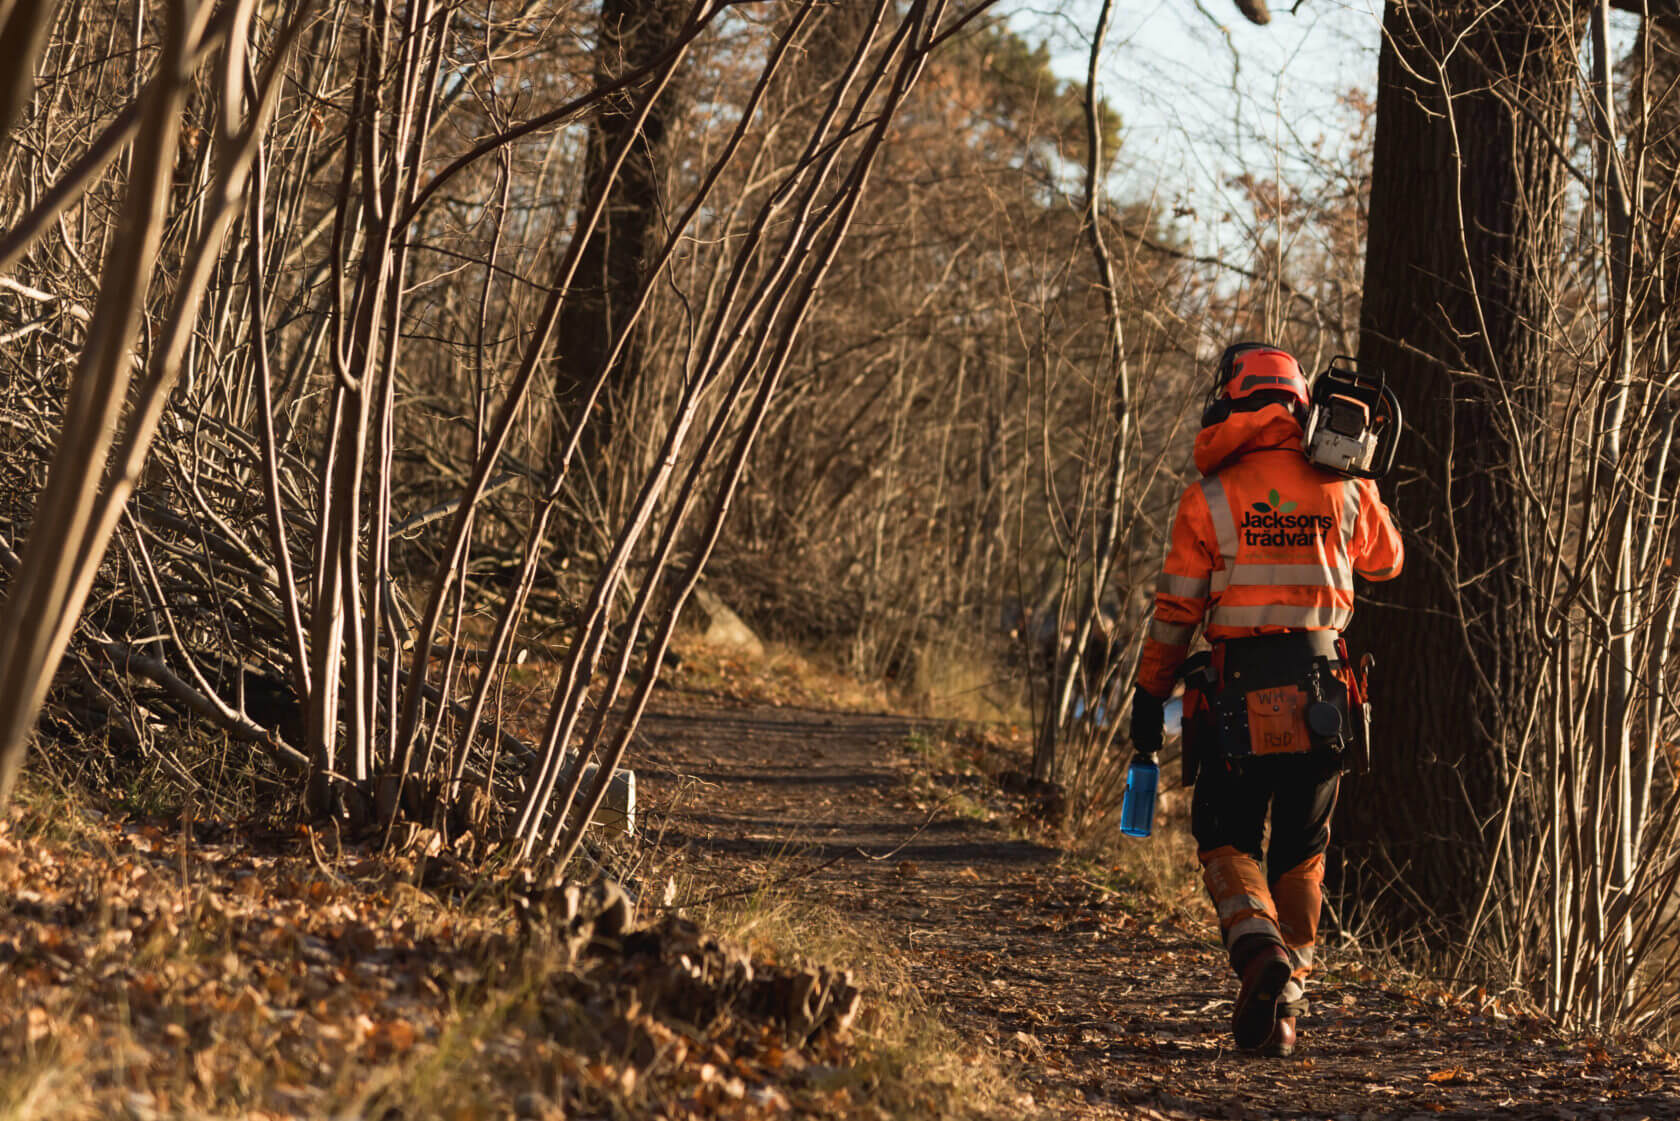 konsulationrådgivning-jacksons-trädvård-skog-sverige